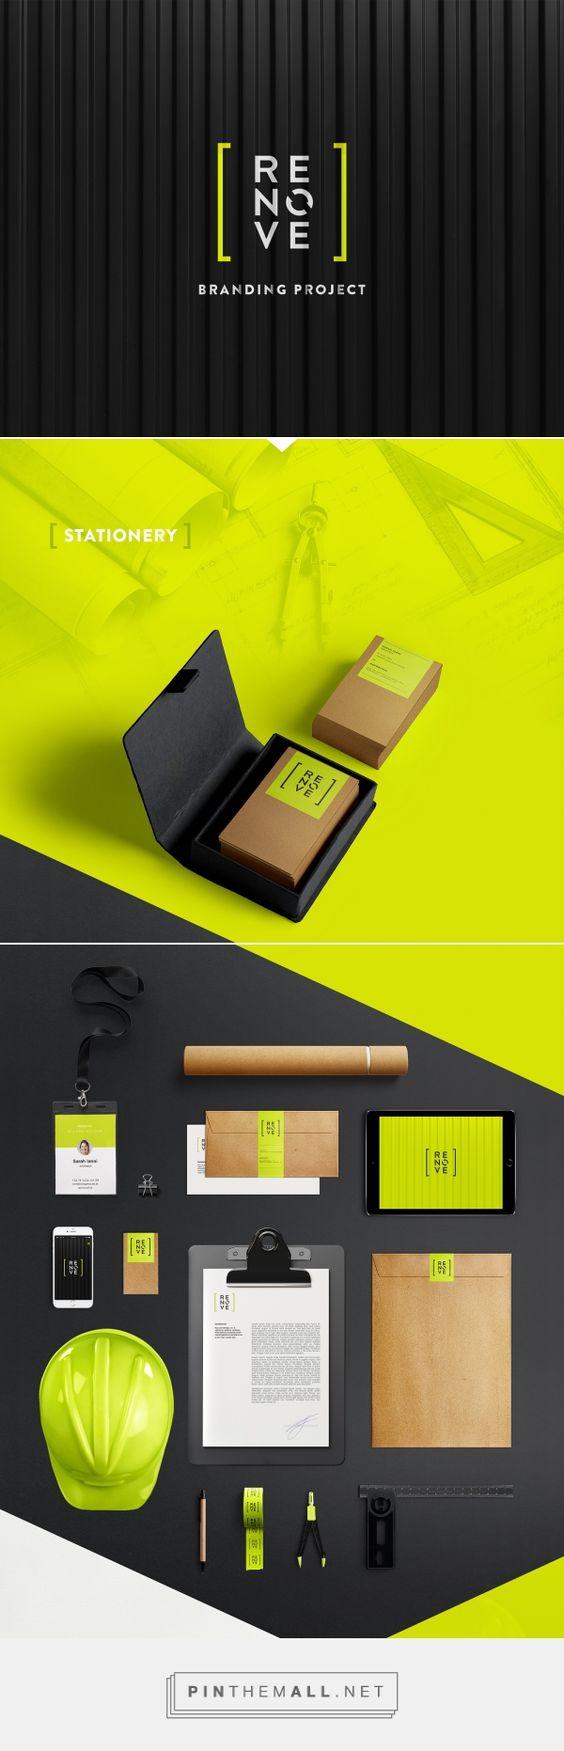 Renove   Brand Identity on Behance    Fivestar Branding – Design and Branding Agency & Inspiration Gallery